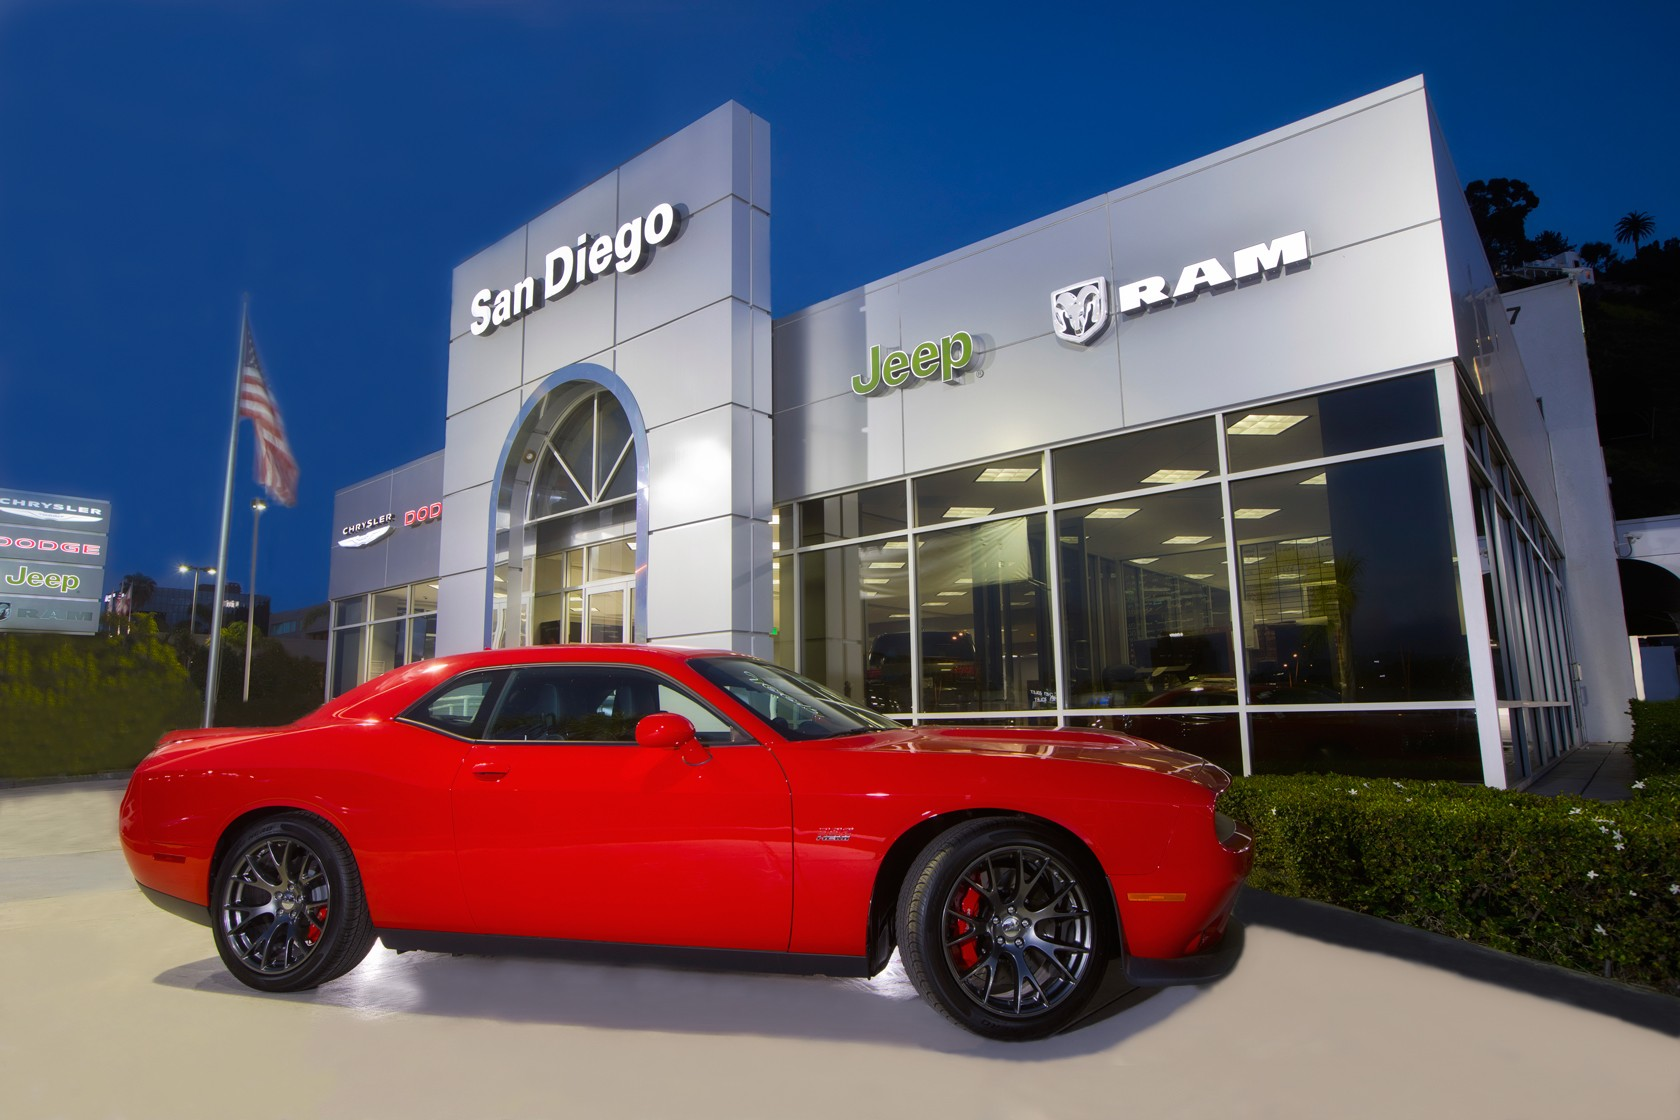 dodge dealership san diego San Diego Chrysler Dodge Jeep Ram  LinkedIn